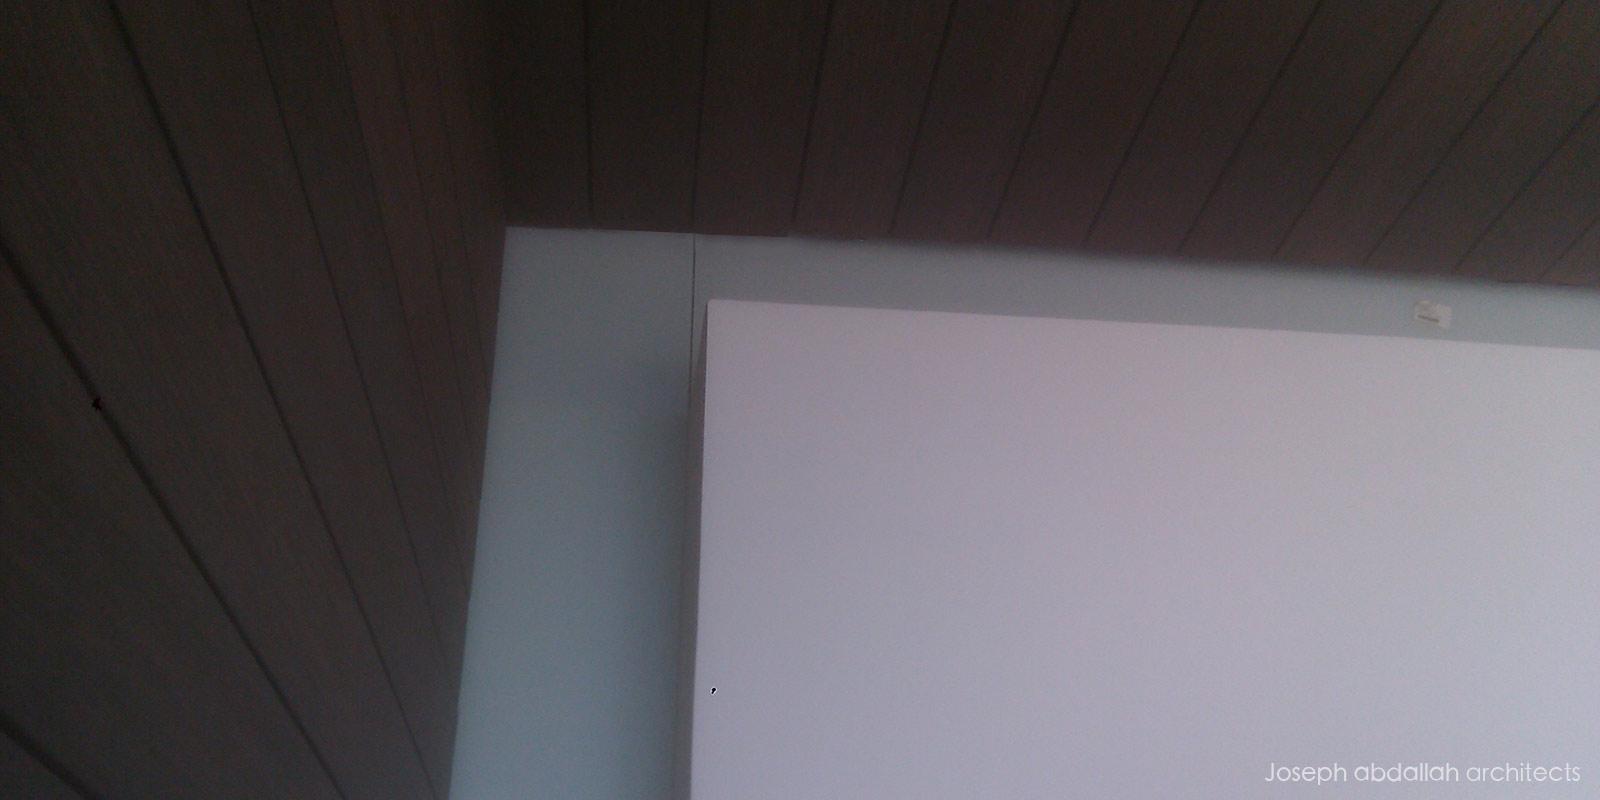 halat-sur-mer-hamod-chalet-interior-architecture-joseph-abdallah-architects-12